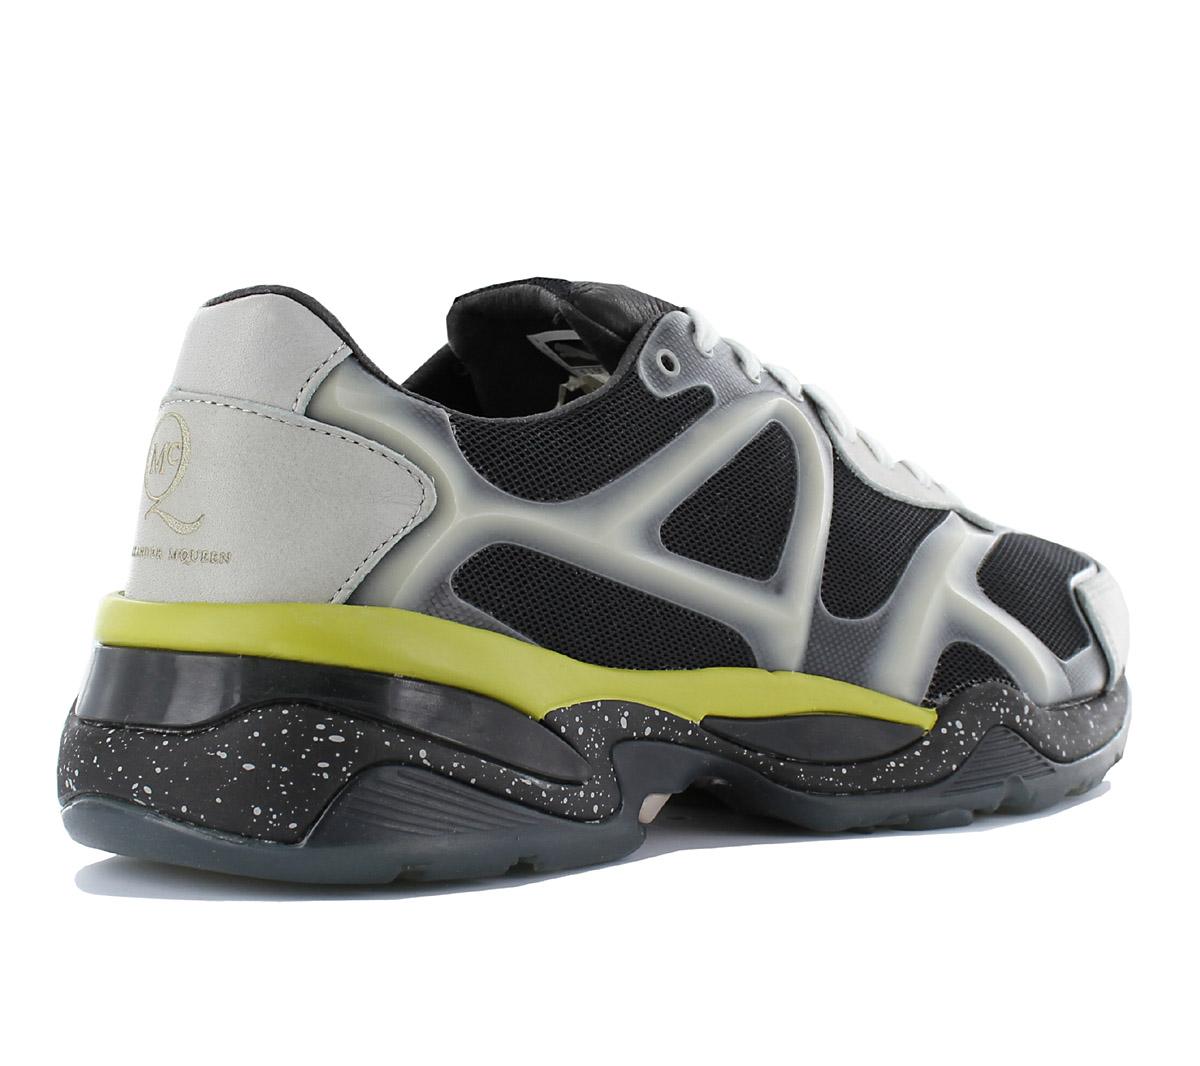 puma amq alexander mcqueen mcq run lo herren schuhe sneaker moonlight 357158 03 ebay. Black Bedroom Furniture Sets. Home Design Ideas